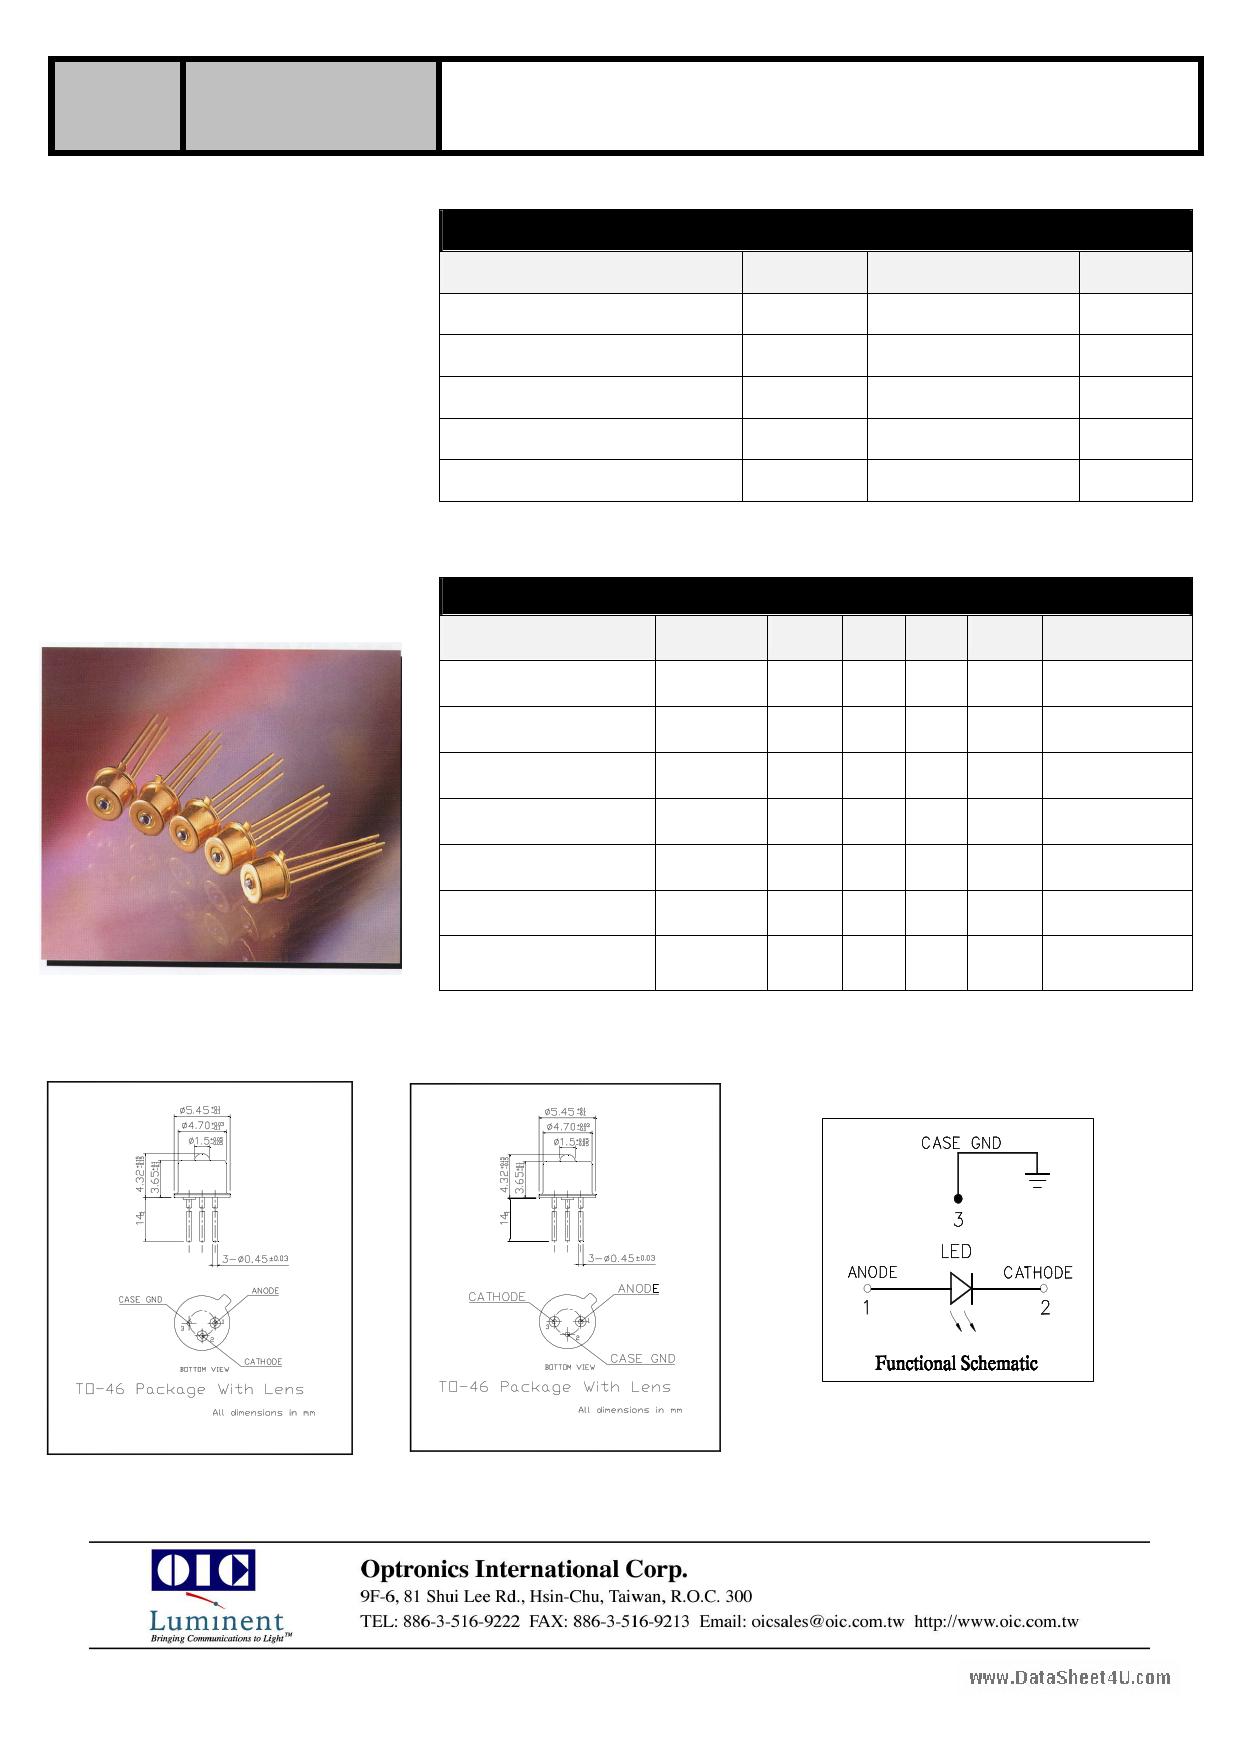 L-13-155-G-BB datasheet